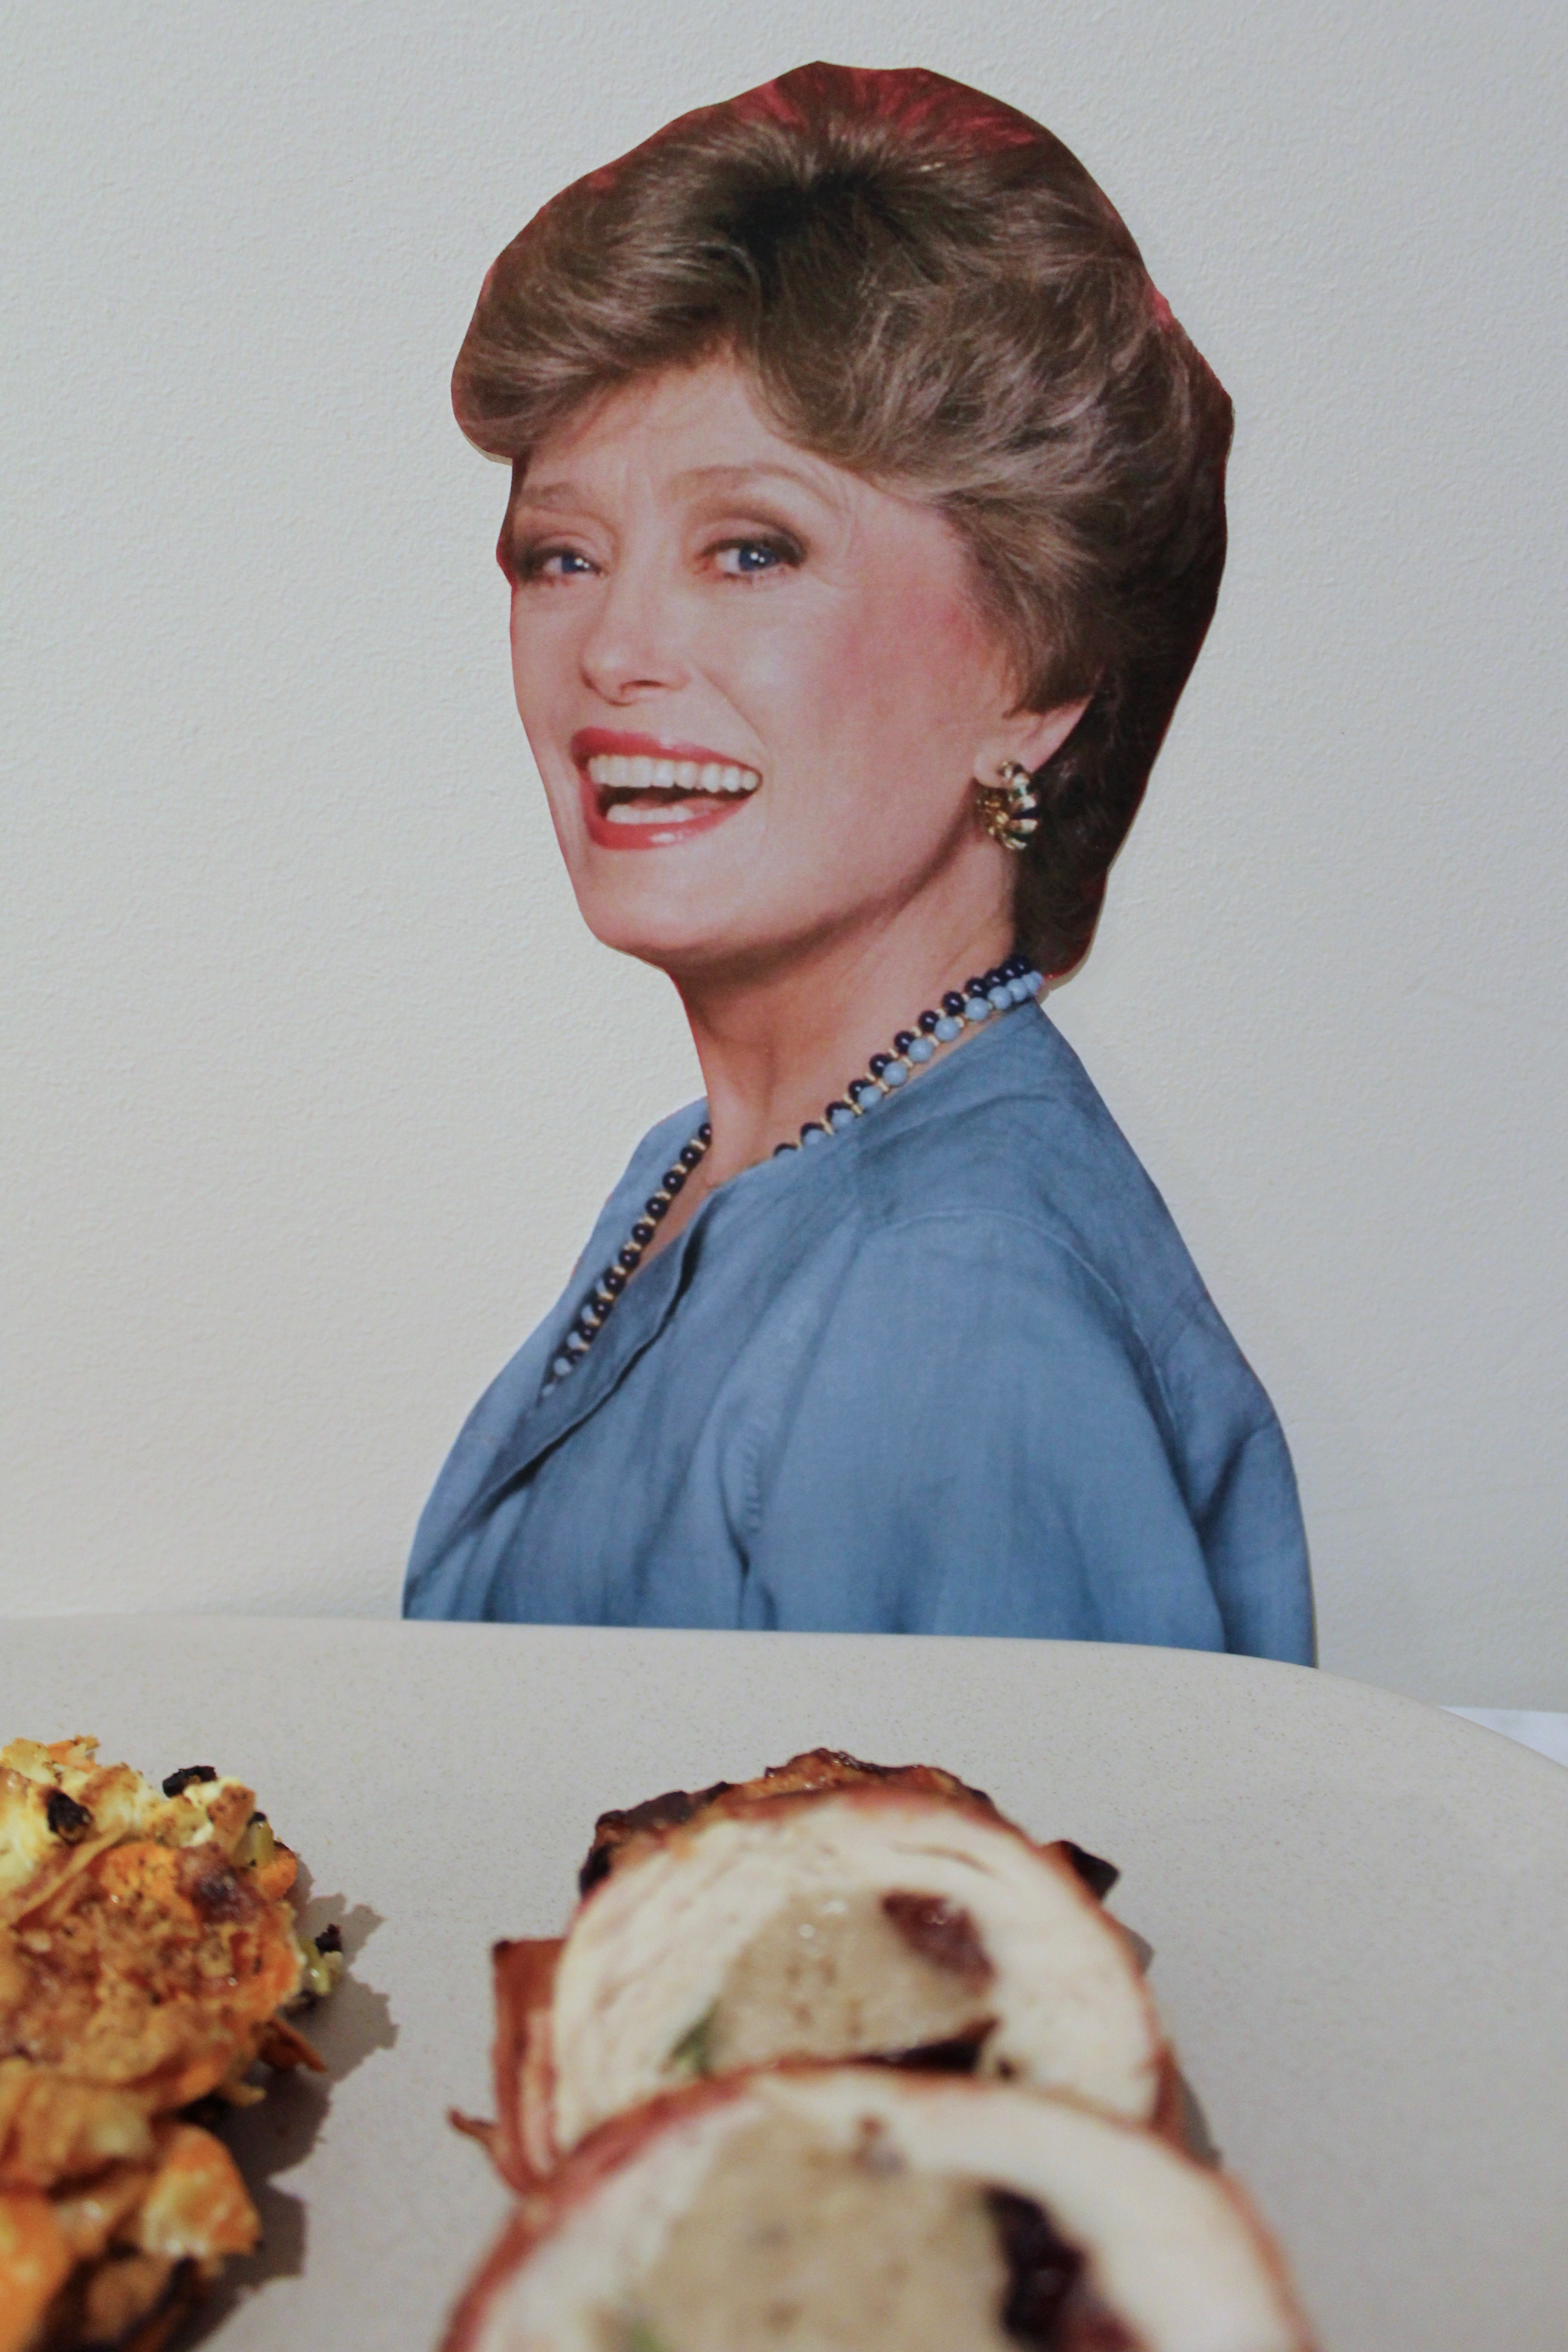 November 2017 – Fame Hungry